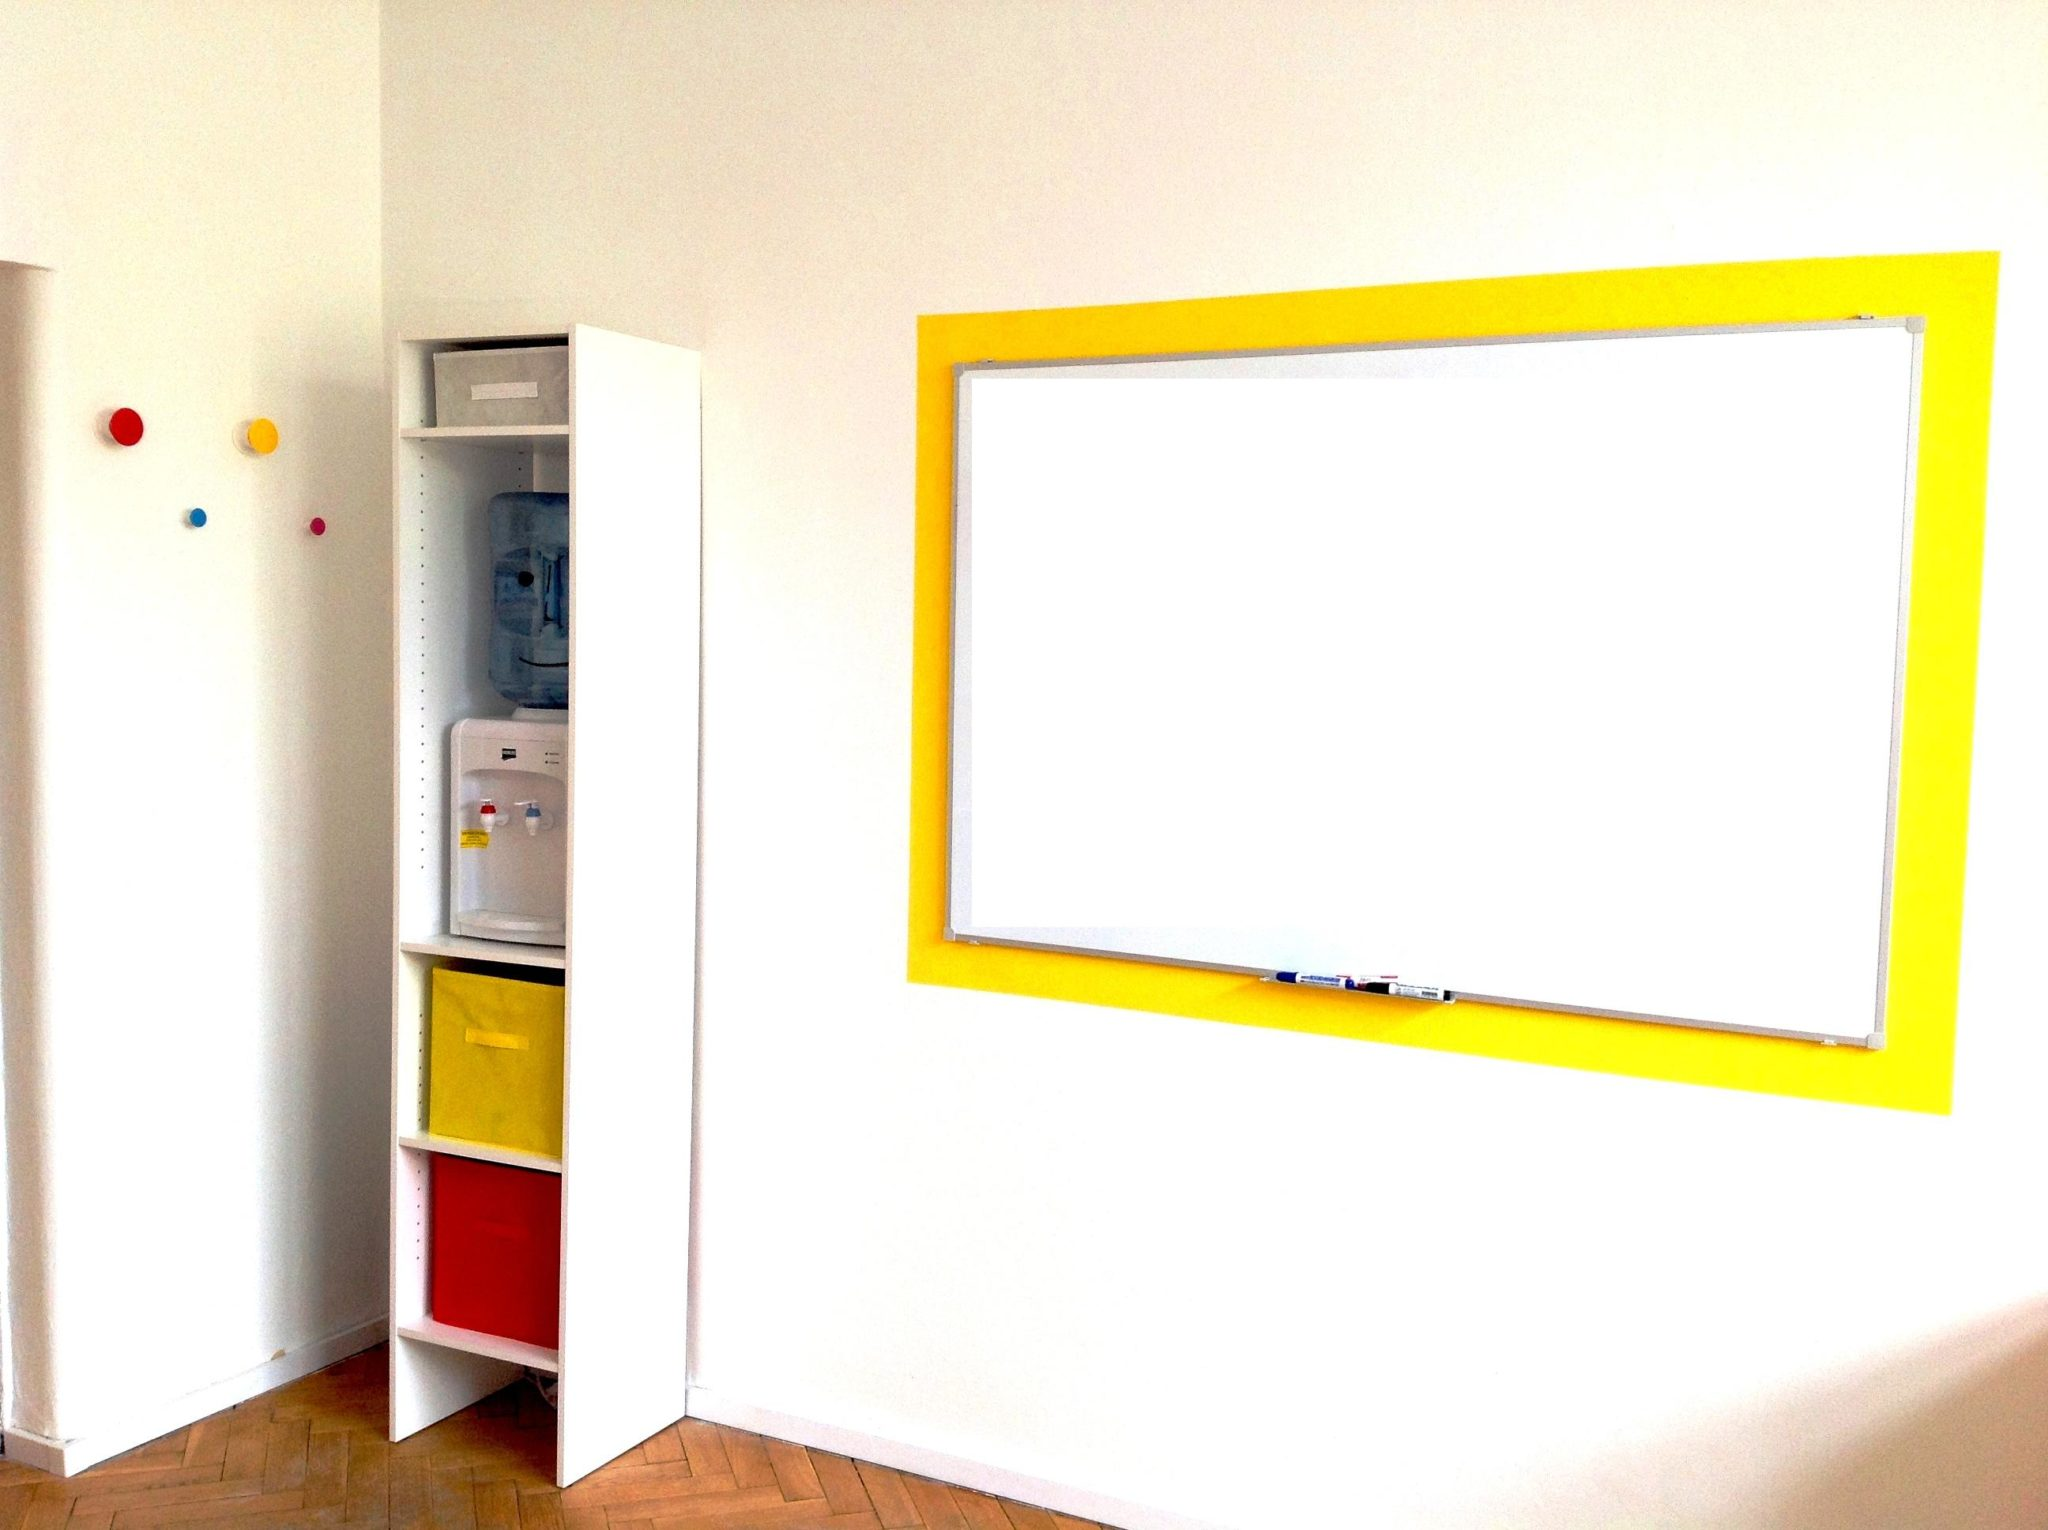 8 projekt wnetrza male kolorowe biuro interior design small colorful office google style forelementspl